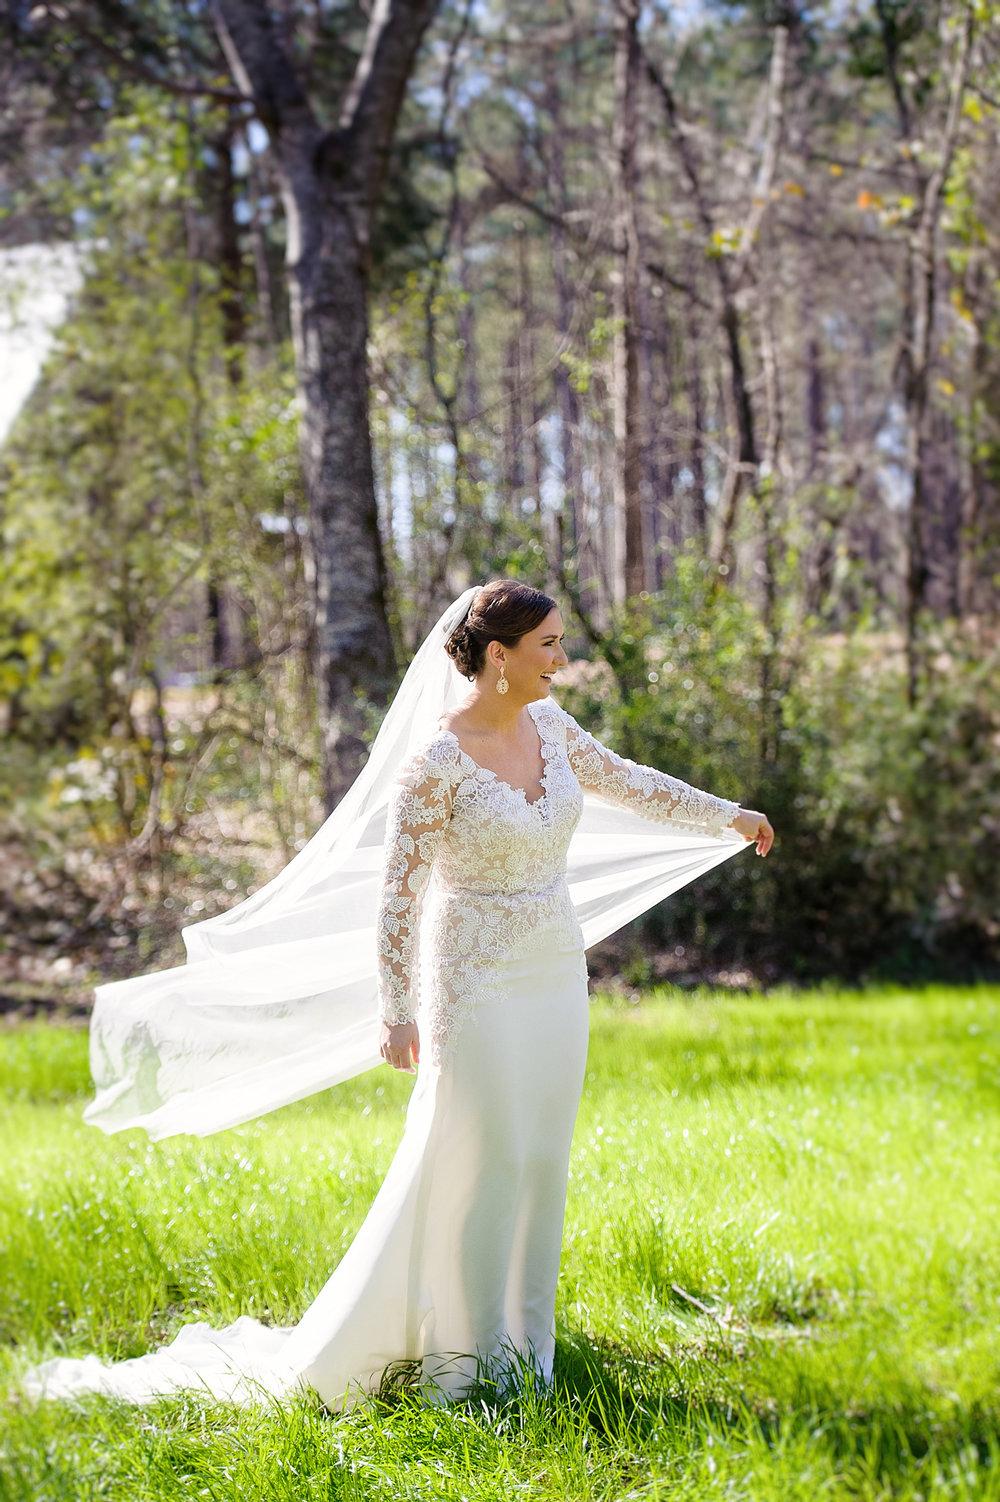 Outdoorwedding-4854.JPG